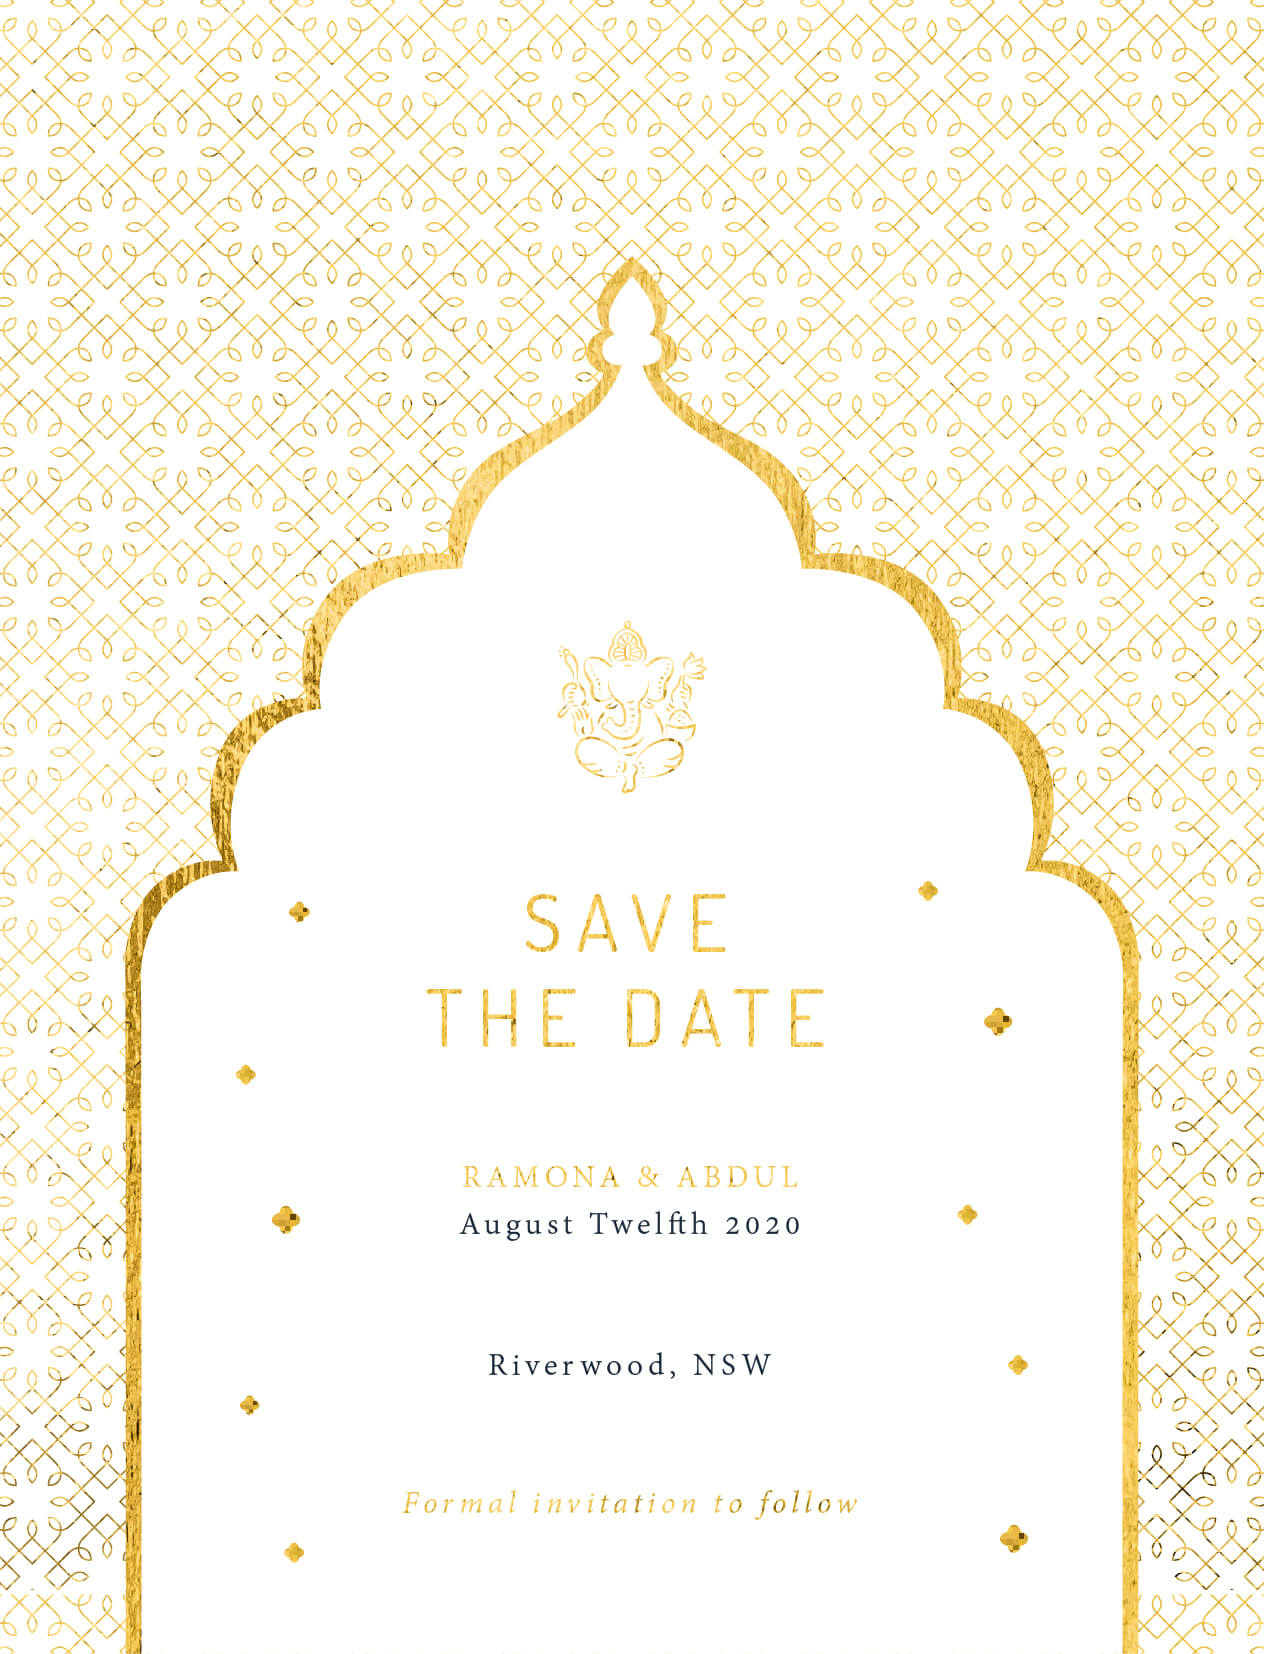 Classic Mumbai - Save The Date